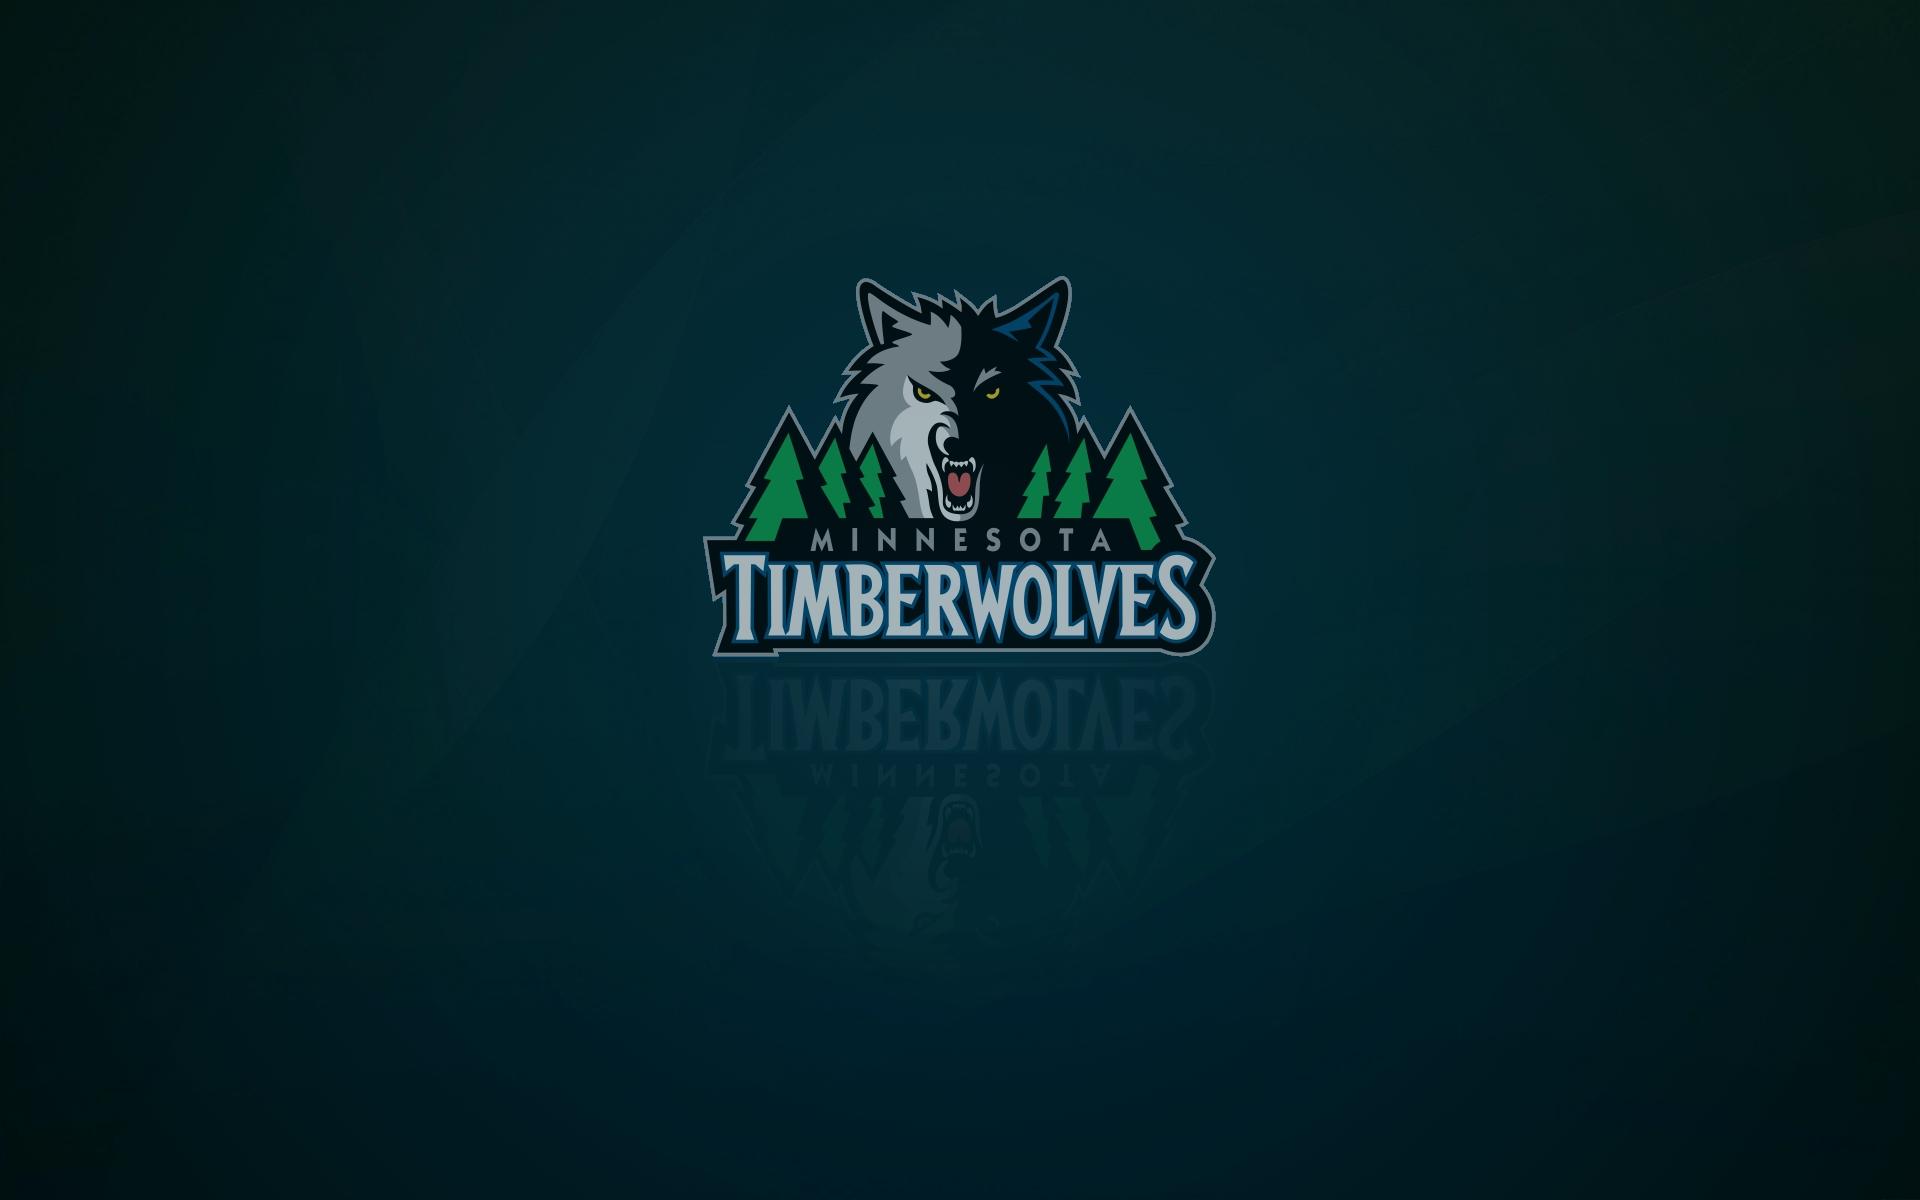 timberwolves wallpaper 1920x1200